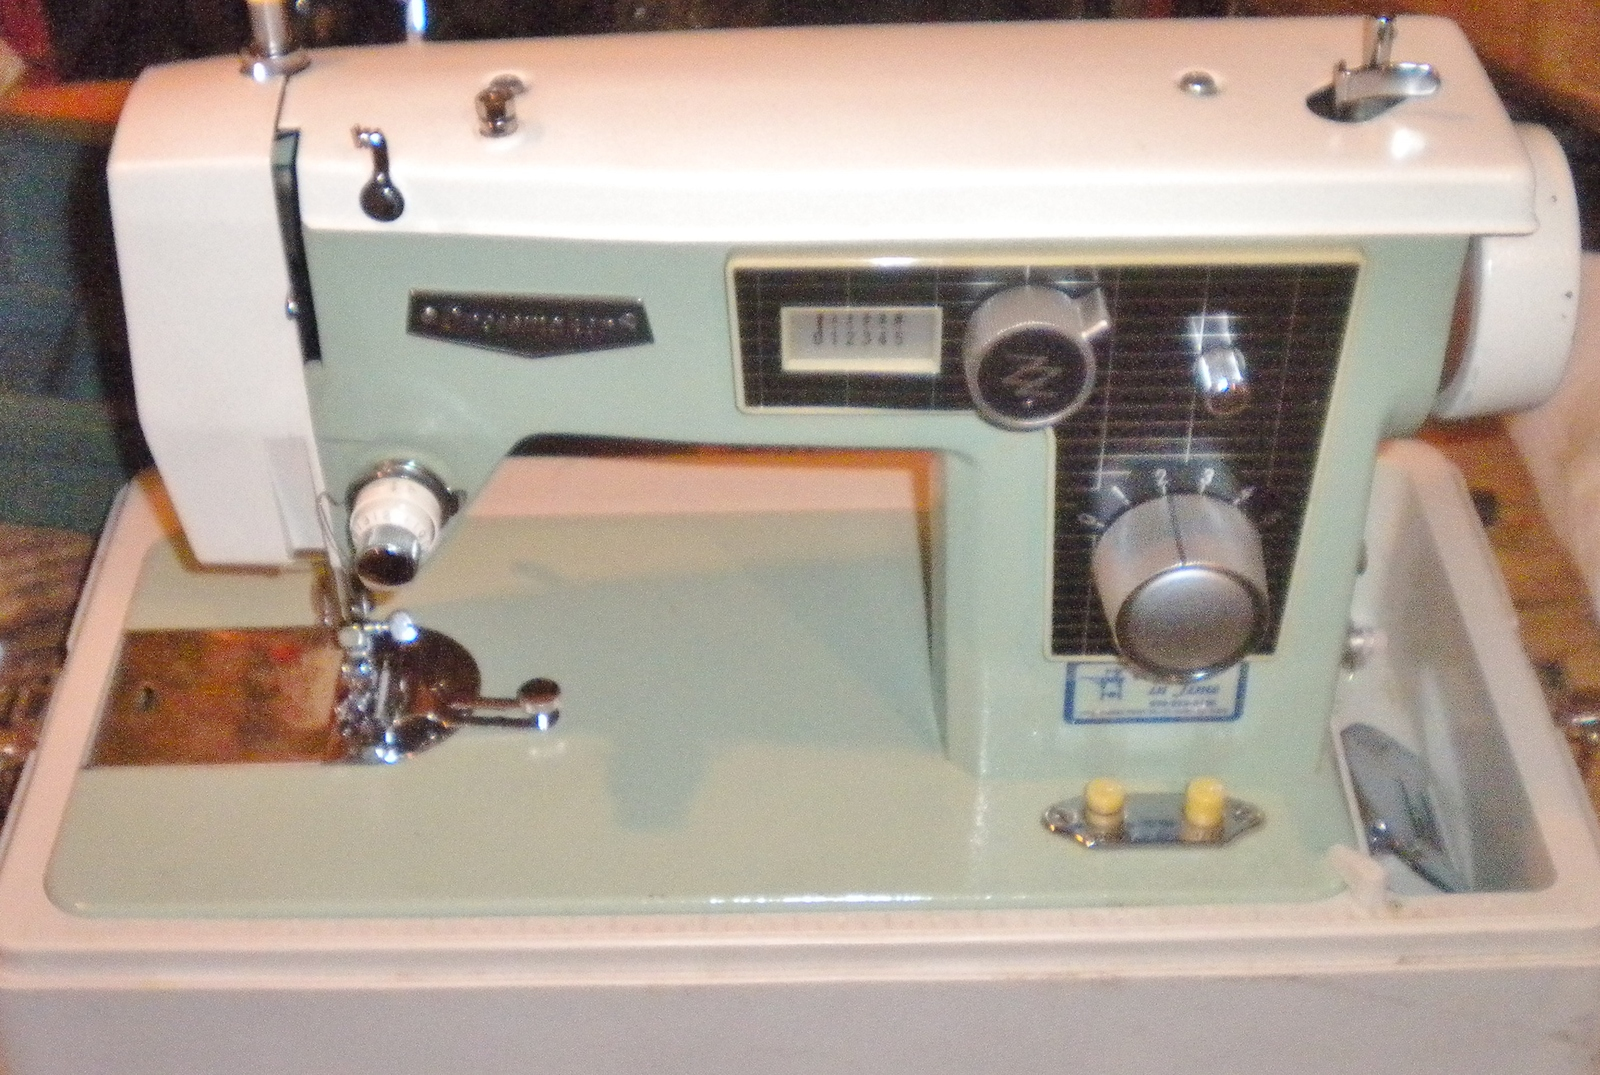 Dressmaker 290A Zig Zag Throat Plate w/Mounting Screws image 3